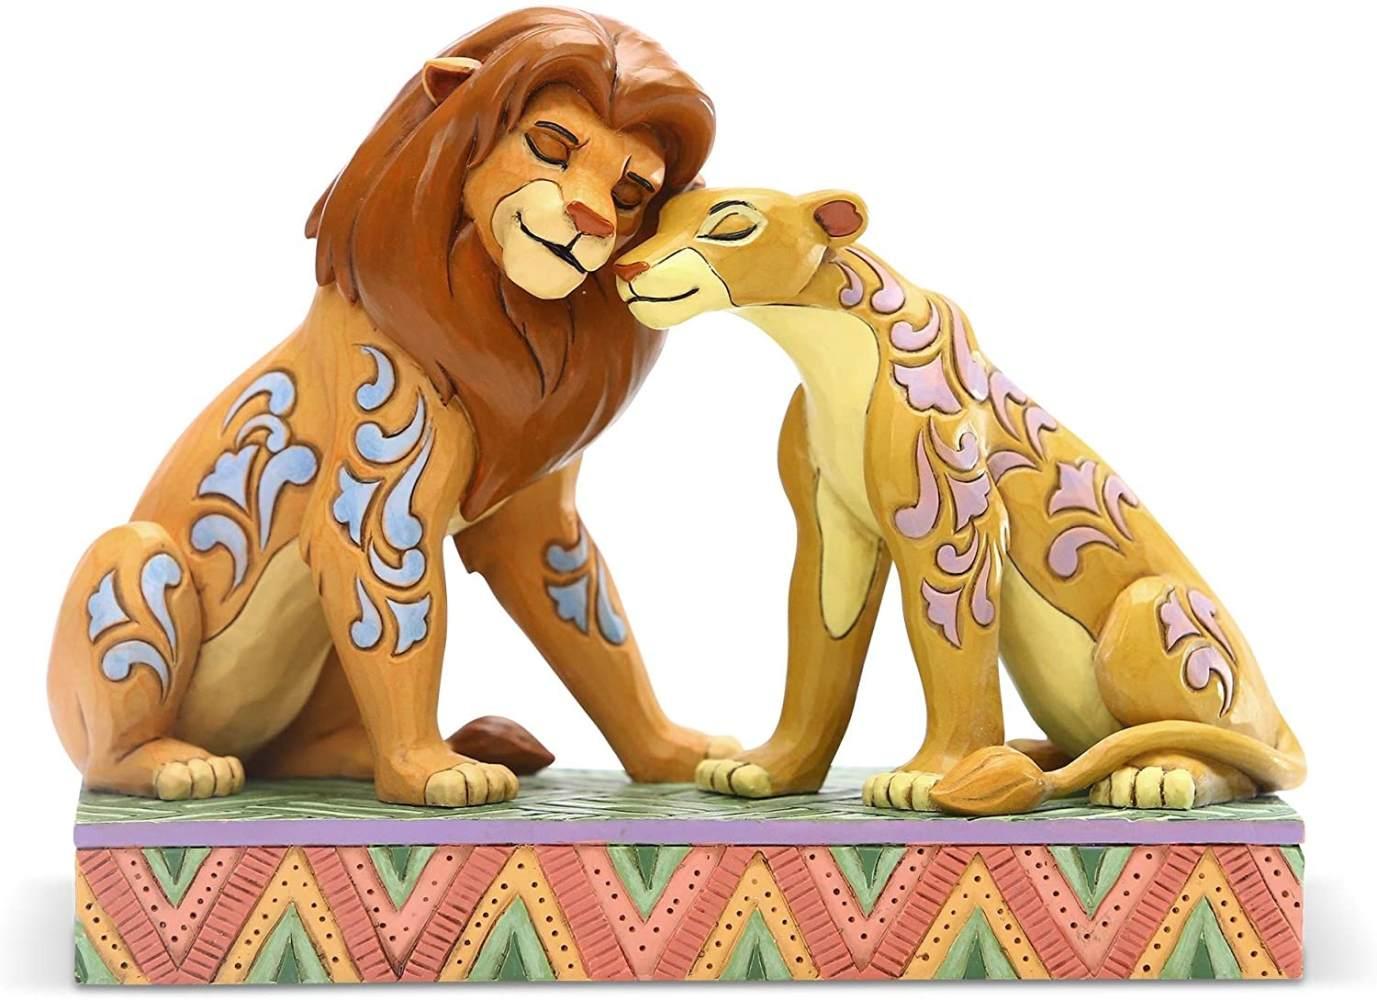 König der Löwen Statue Simba and Nala Snuggling 13 cm Bild 1